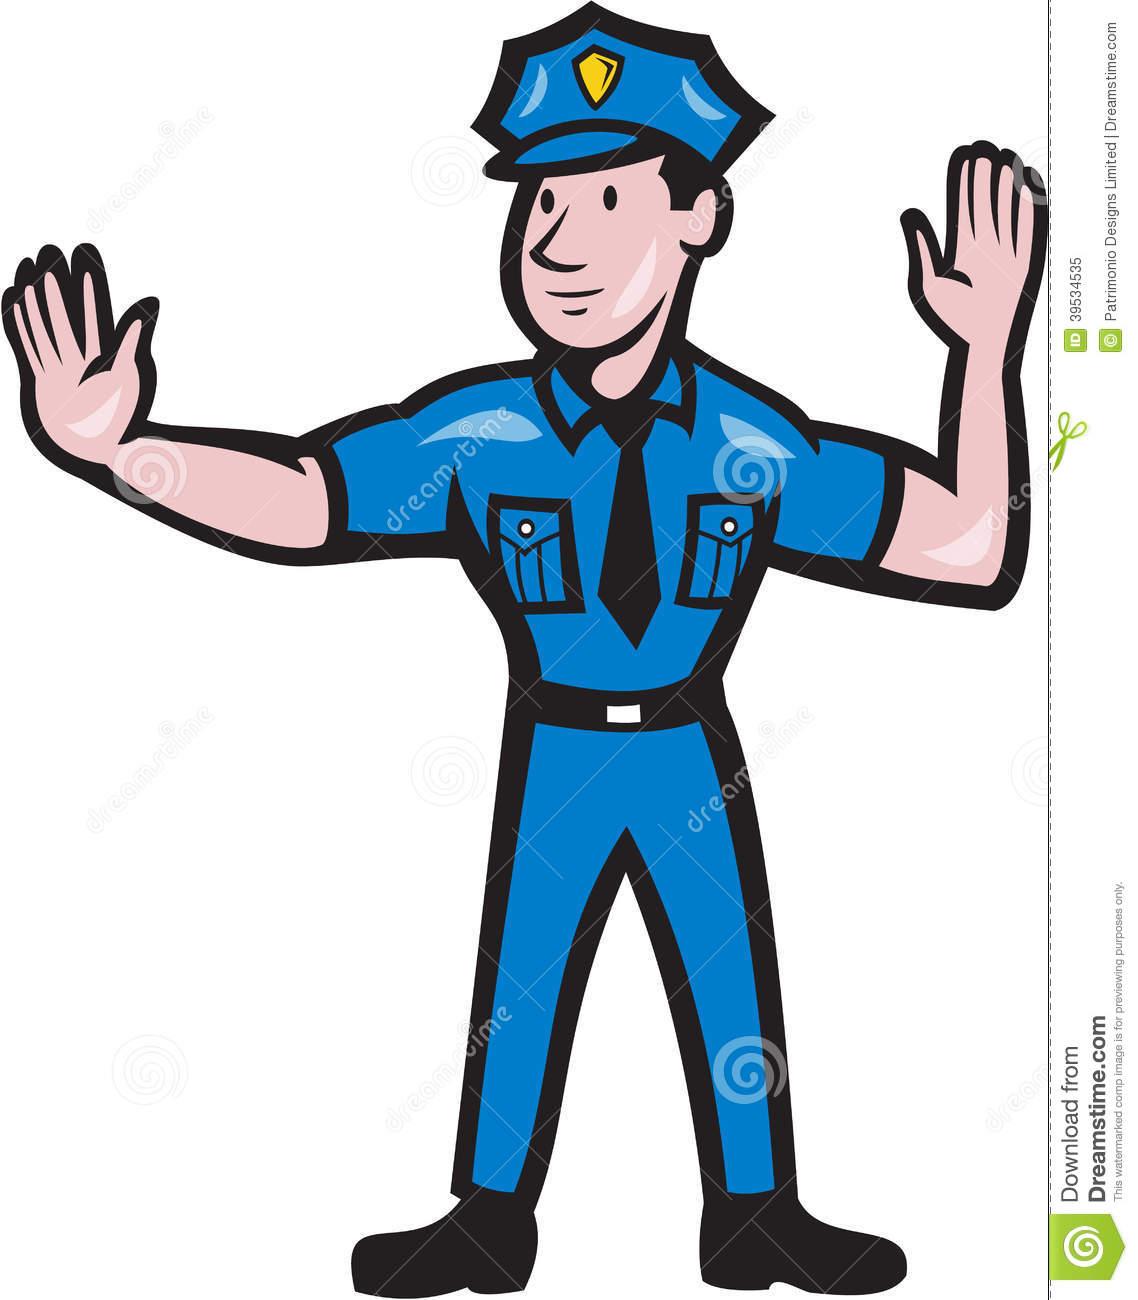 1138x1300 Cartoon Police Officer Clipart